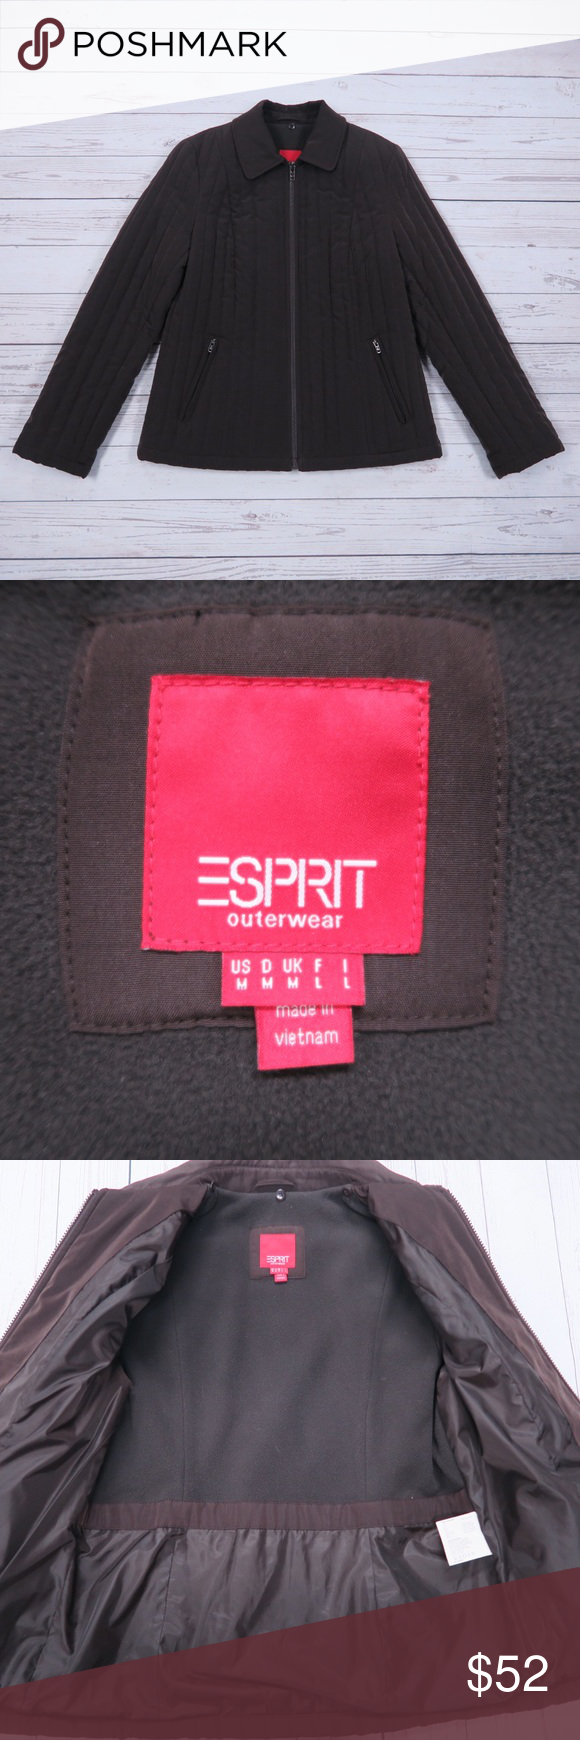 Esprit Jacket Brown Jacket Jackets Esprit [ 1740 x 580 Pixel ]